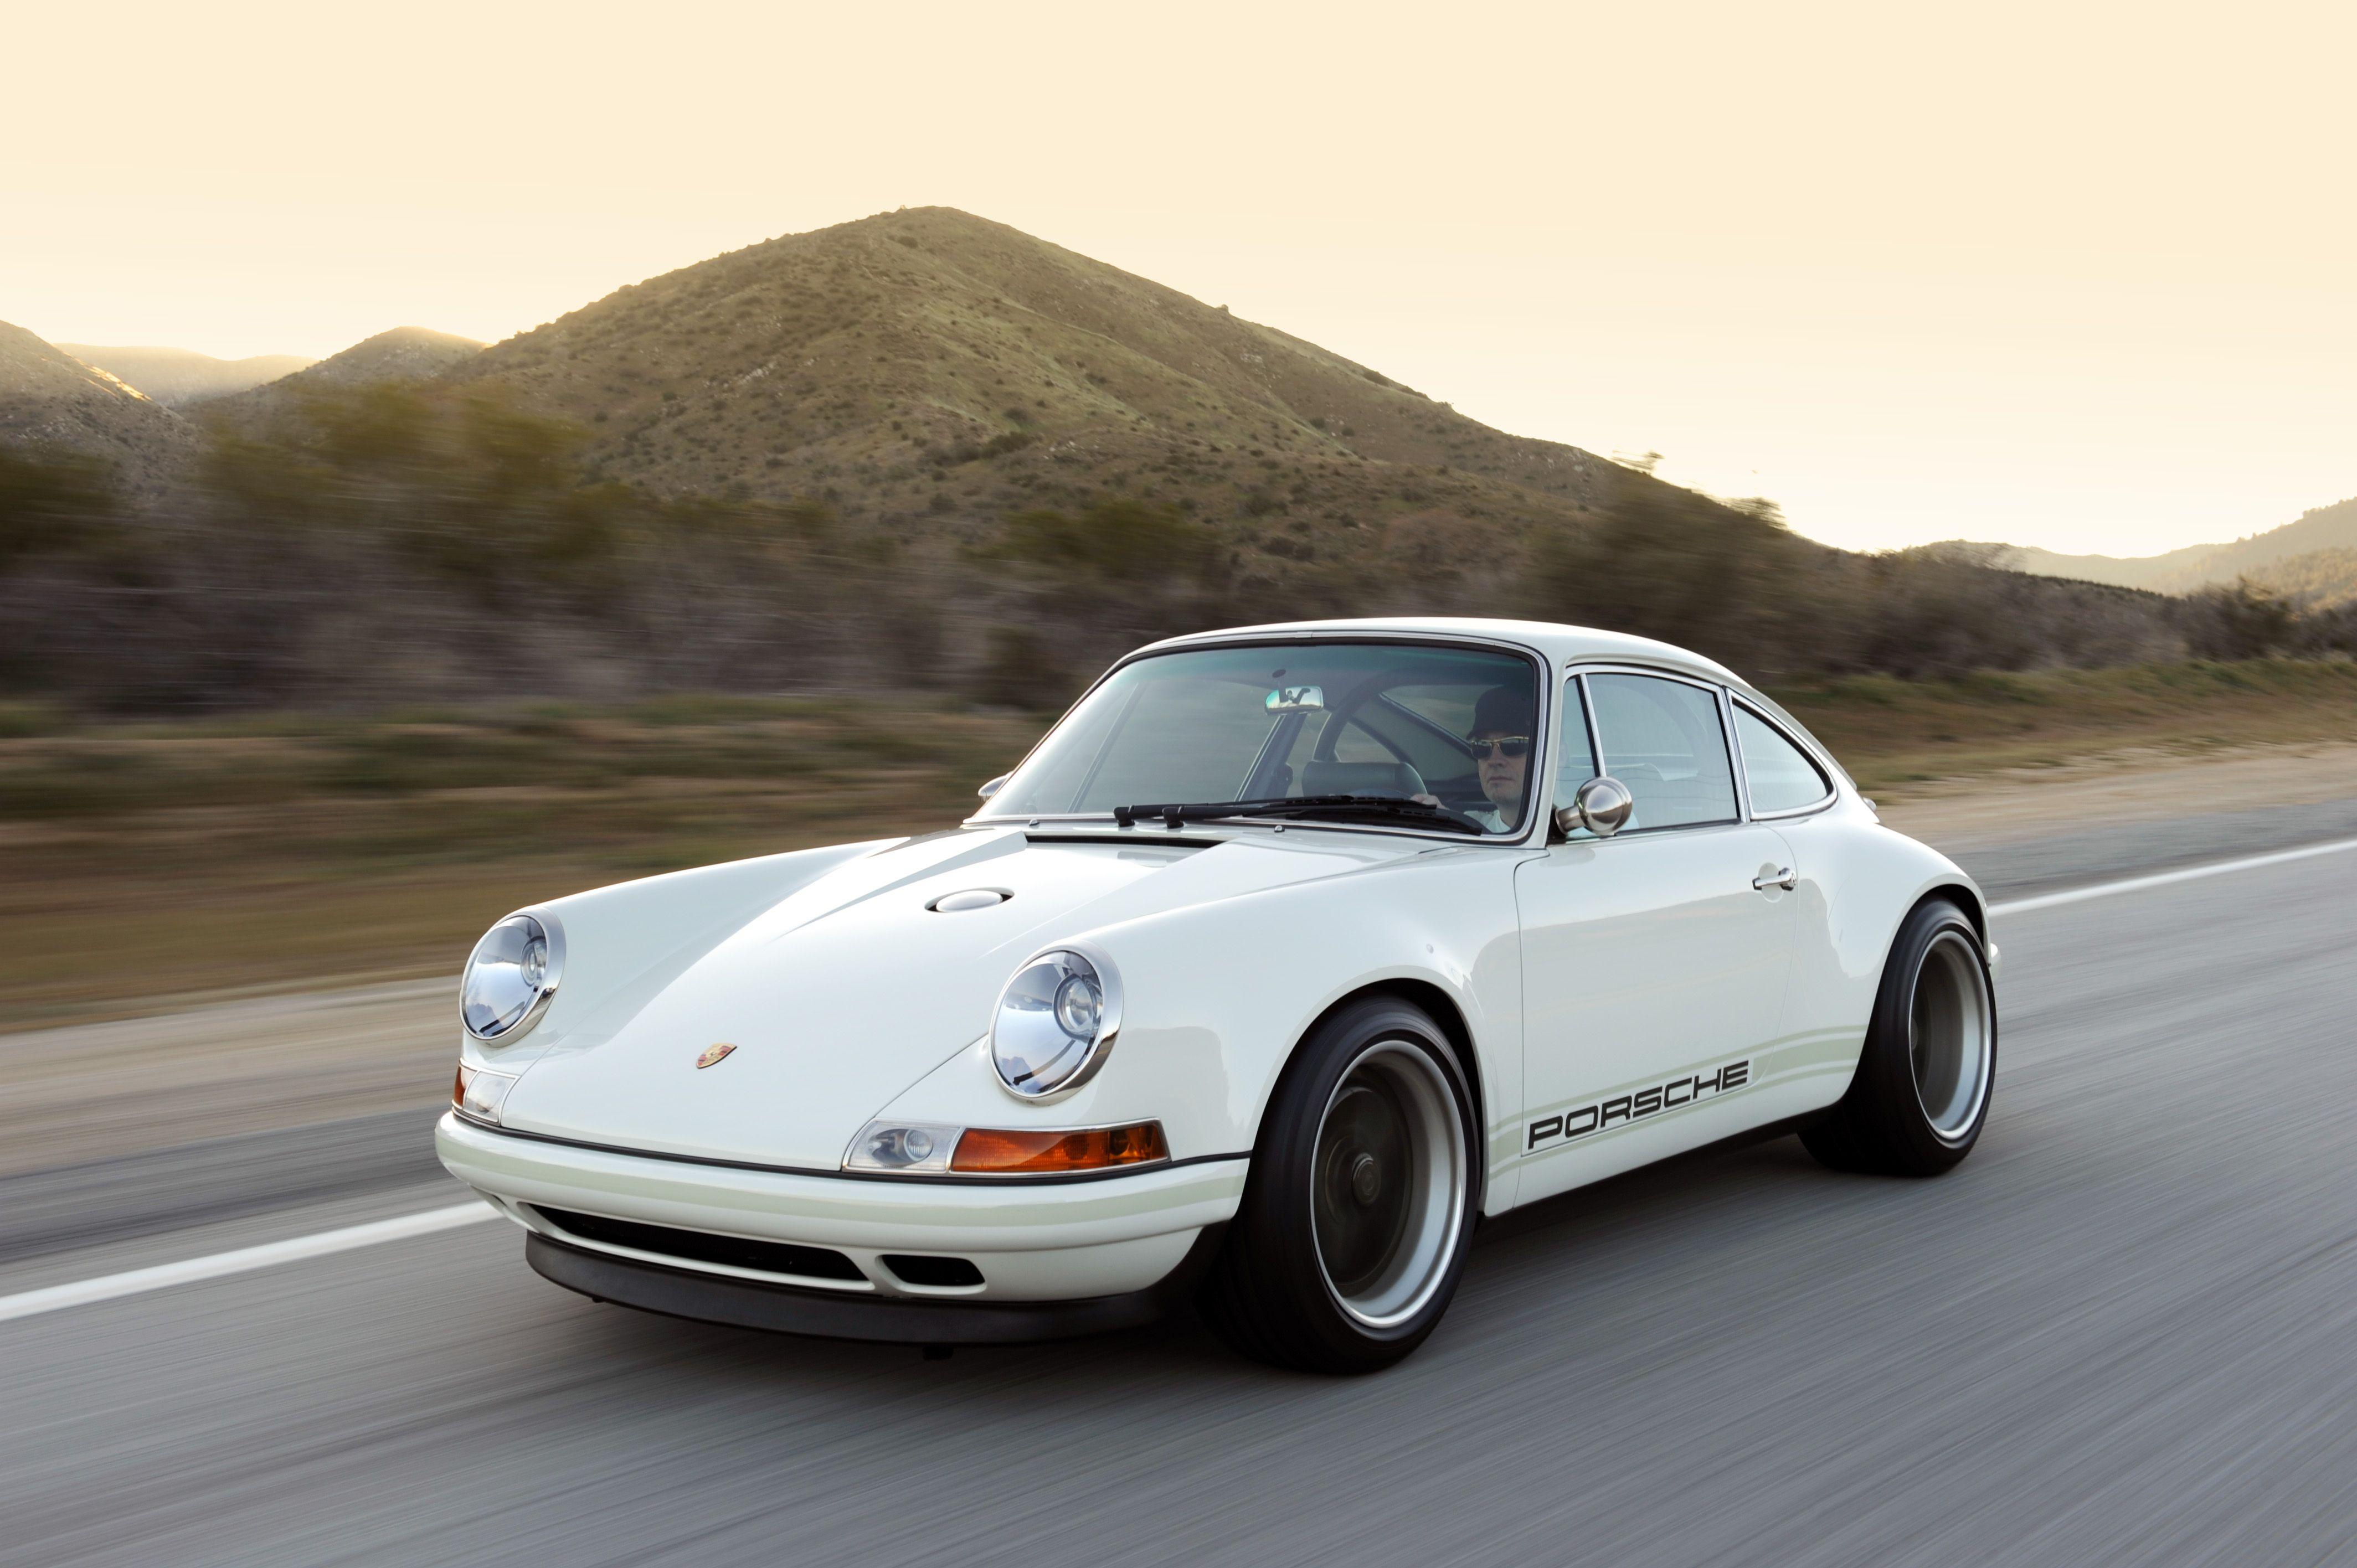 Singer Porsche 911 70 S Singer Porsche Porsche 911 Custom Porsche